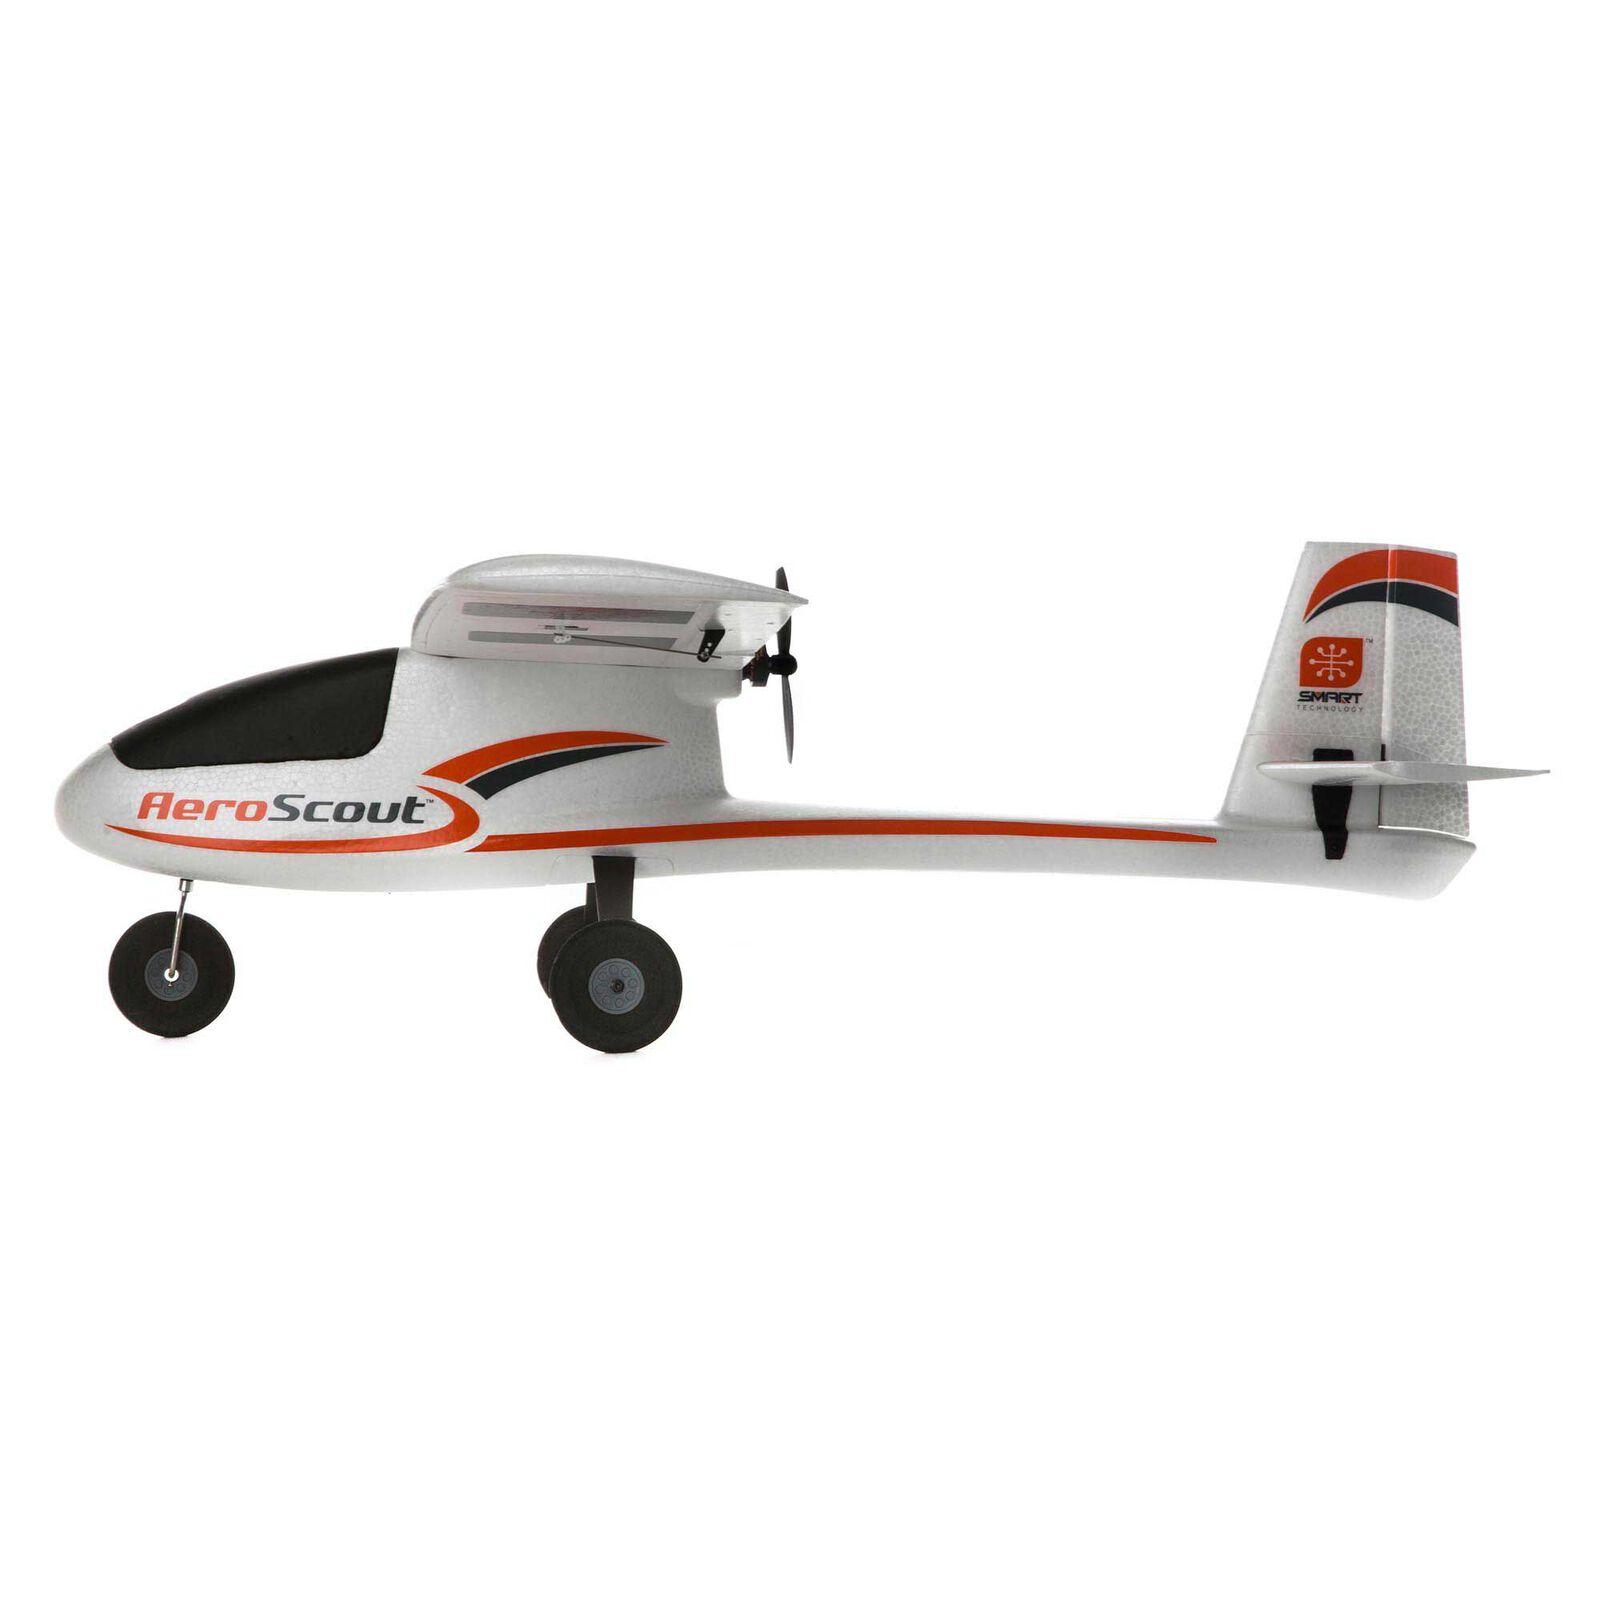 AeroScout S 2 1.1m BNF Basic